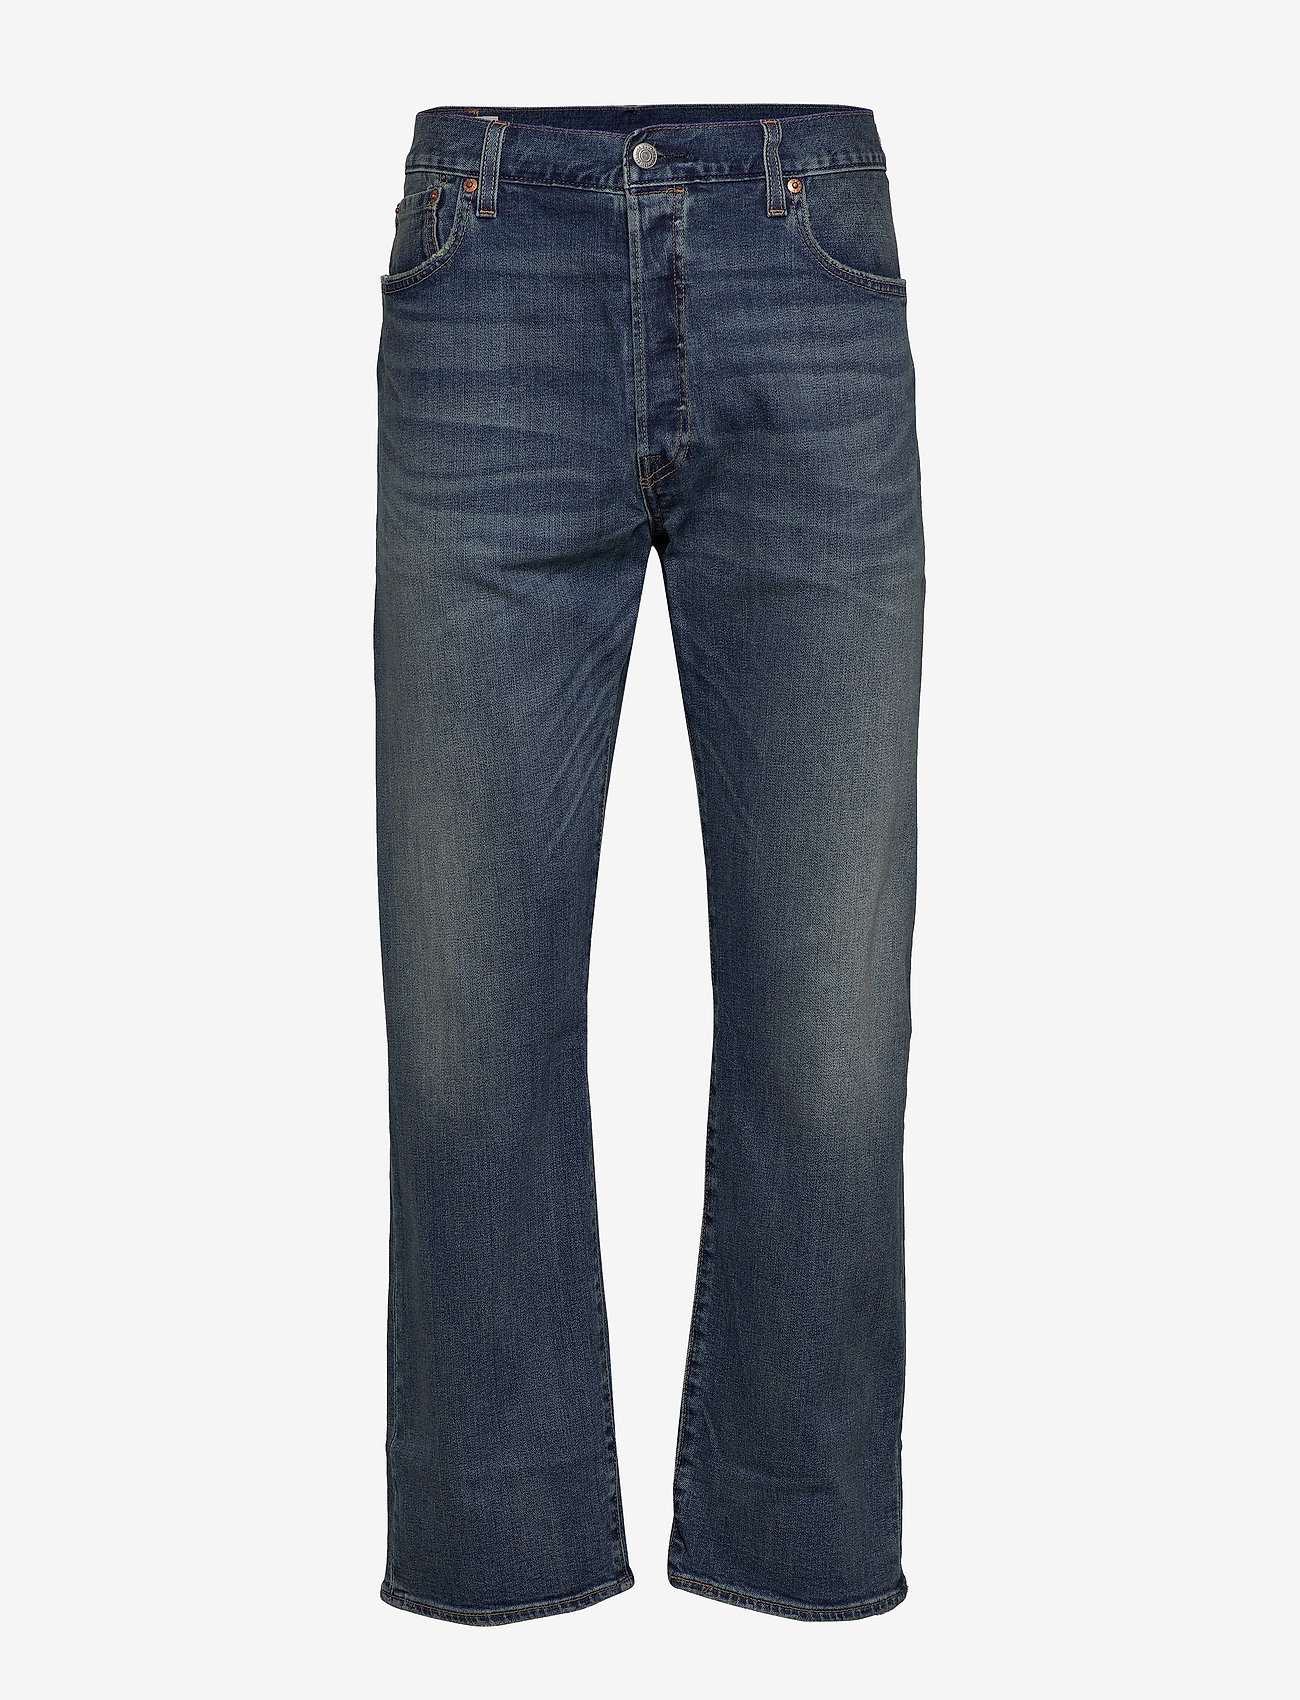 LEVI´S Men - 501 LEVISORIGINAL CANDY PAINT - regular jeans - med indigo - worn in - 0